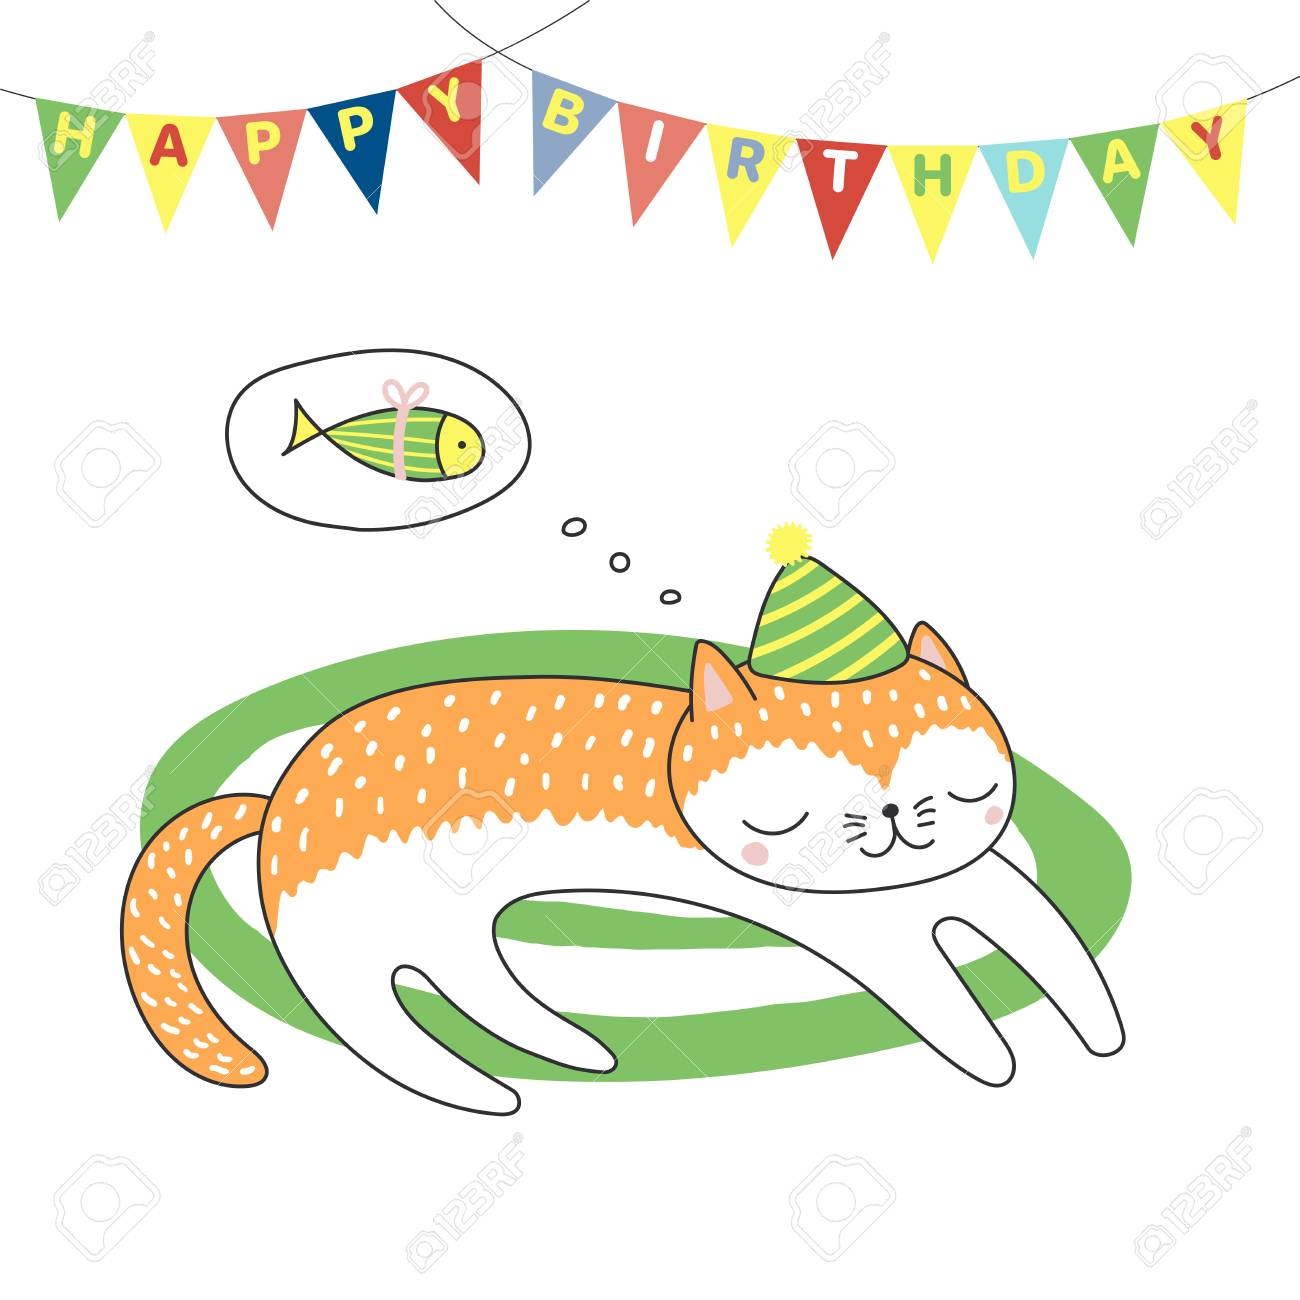 Hand drawn happy birthday greeting card with cute funny cartoon hand drawn happy birthday greeting card with cute funny cartoon cat sleeping on a rug m4hsunfo